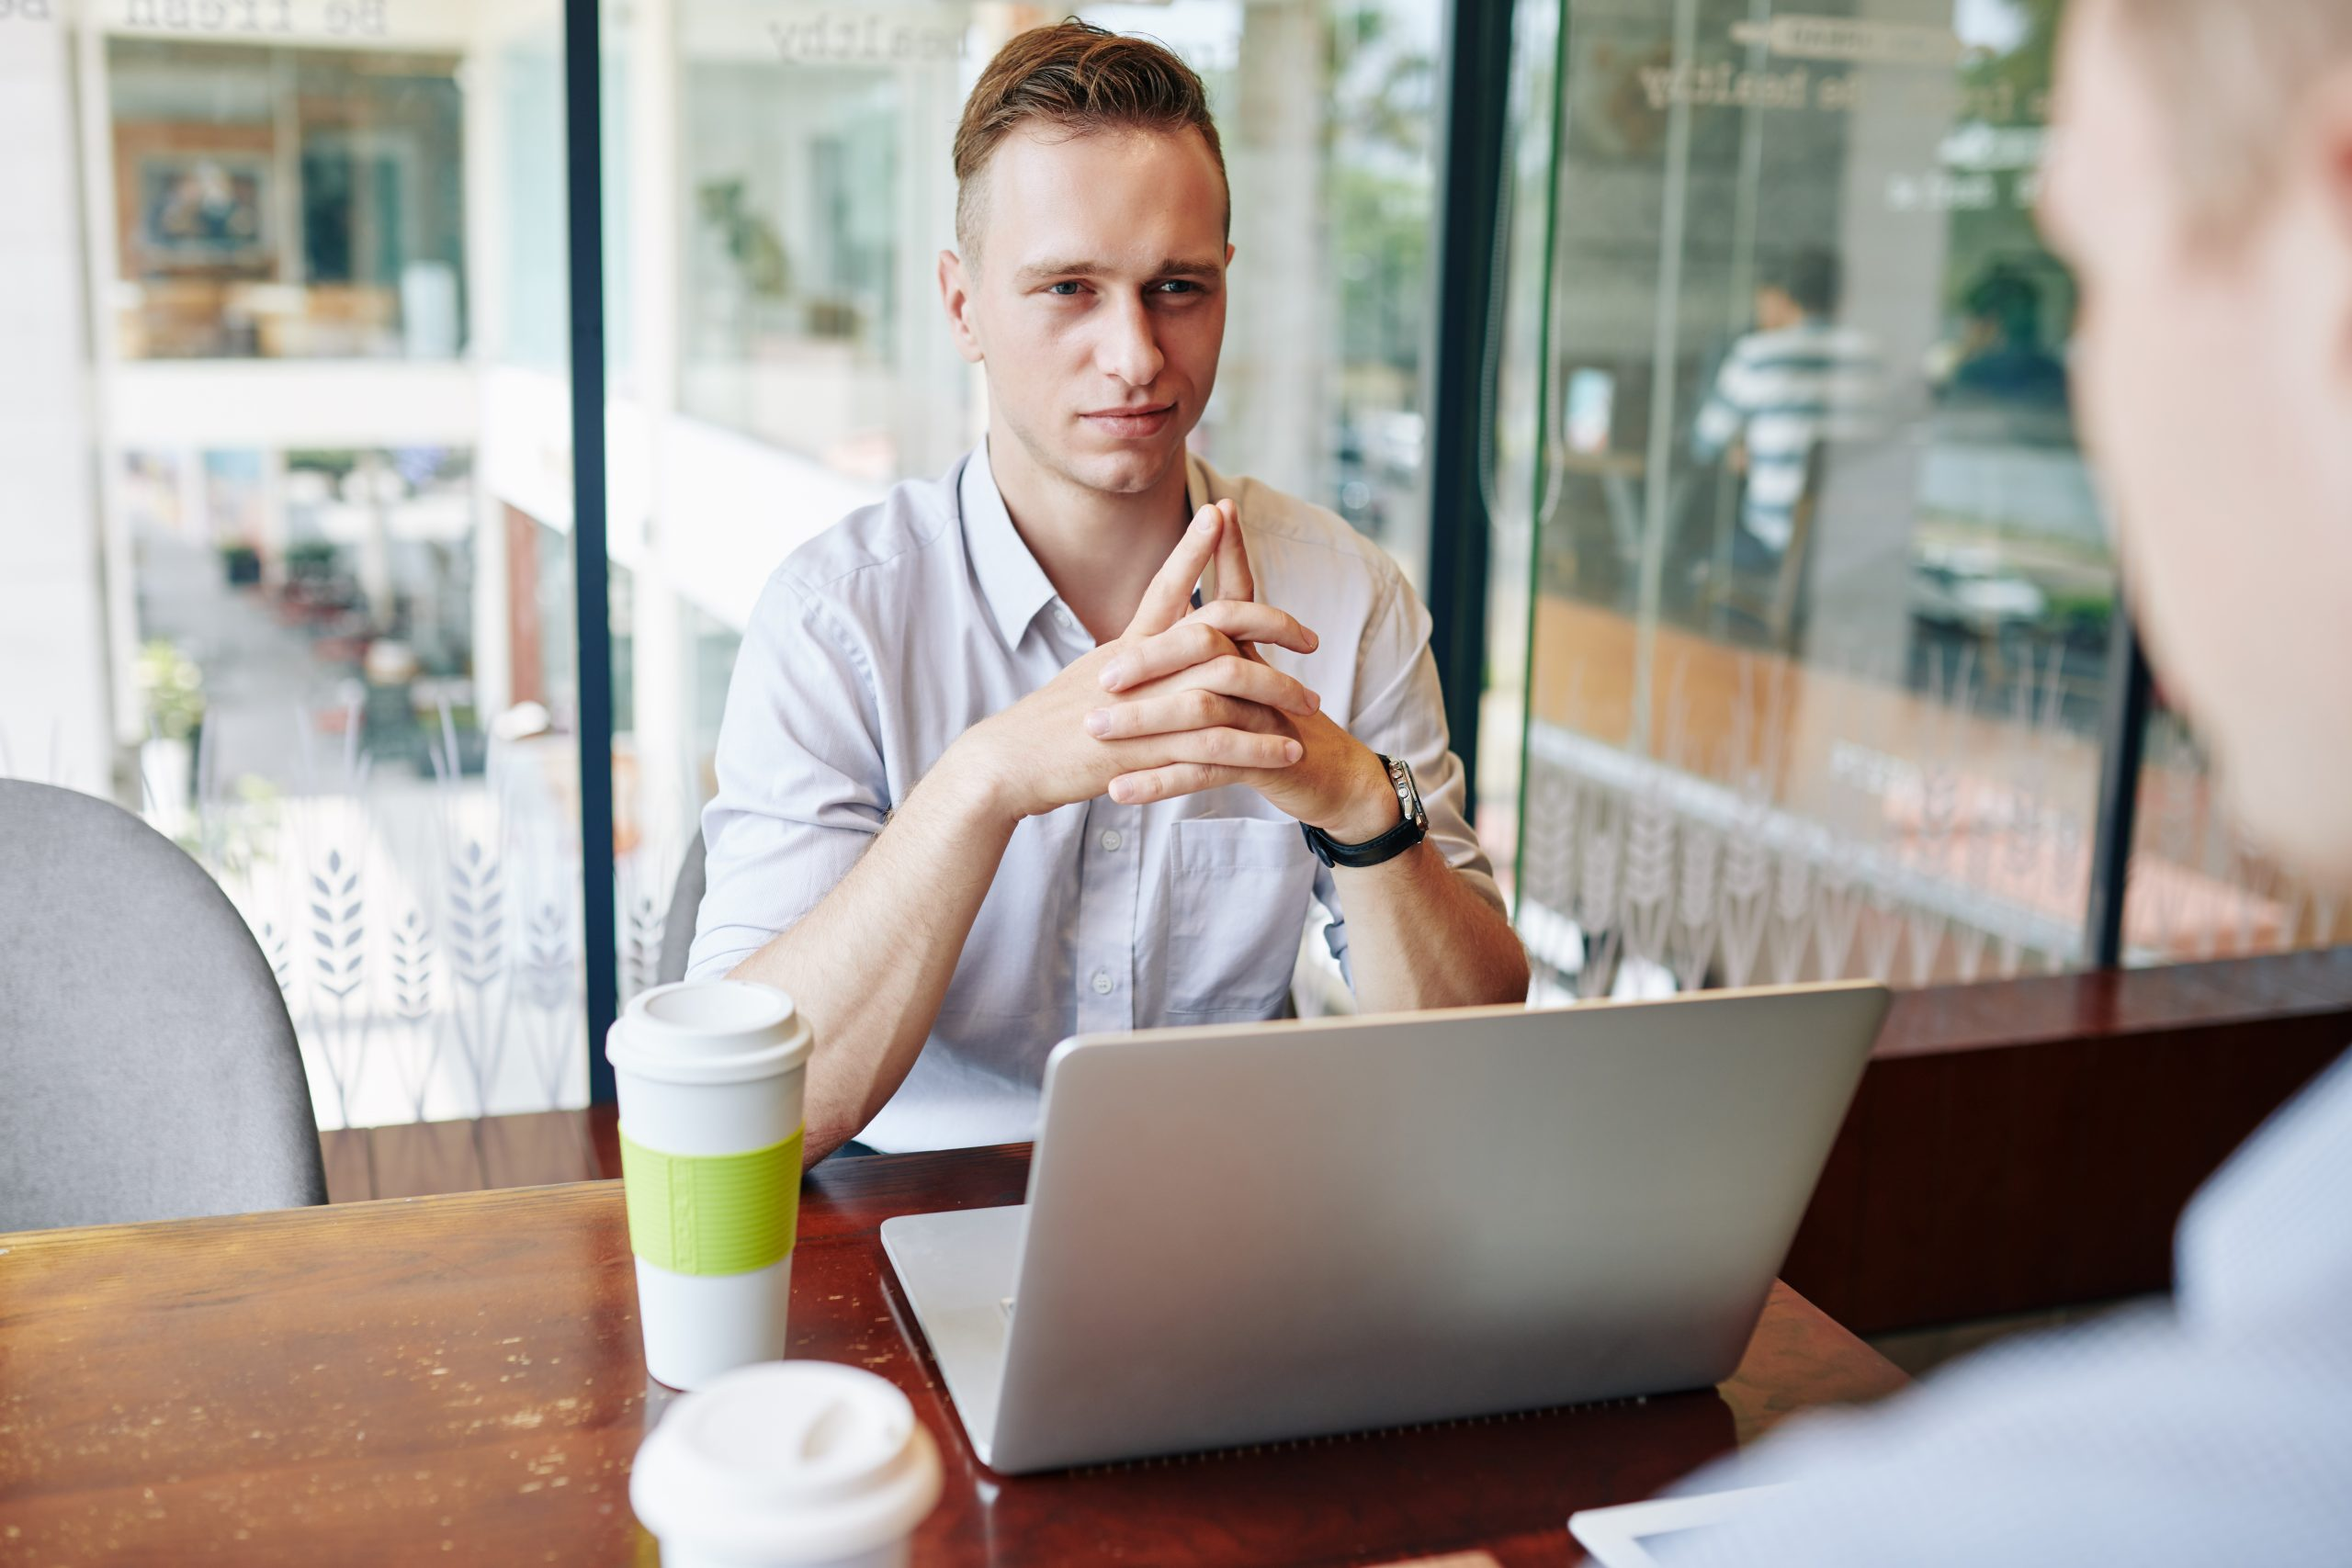 Entretien d'embauche rédiger un CV effiace